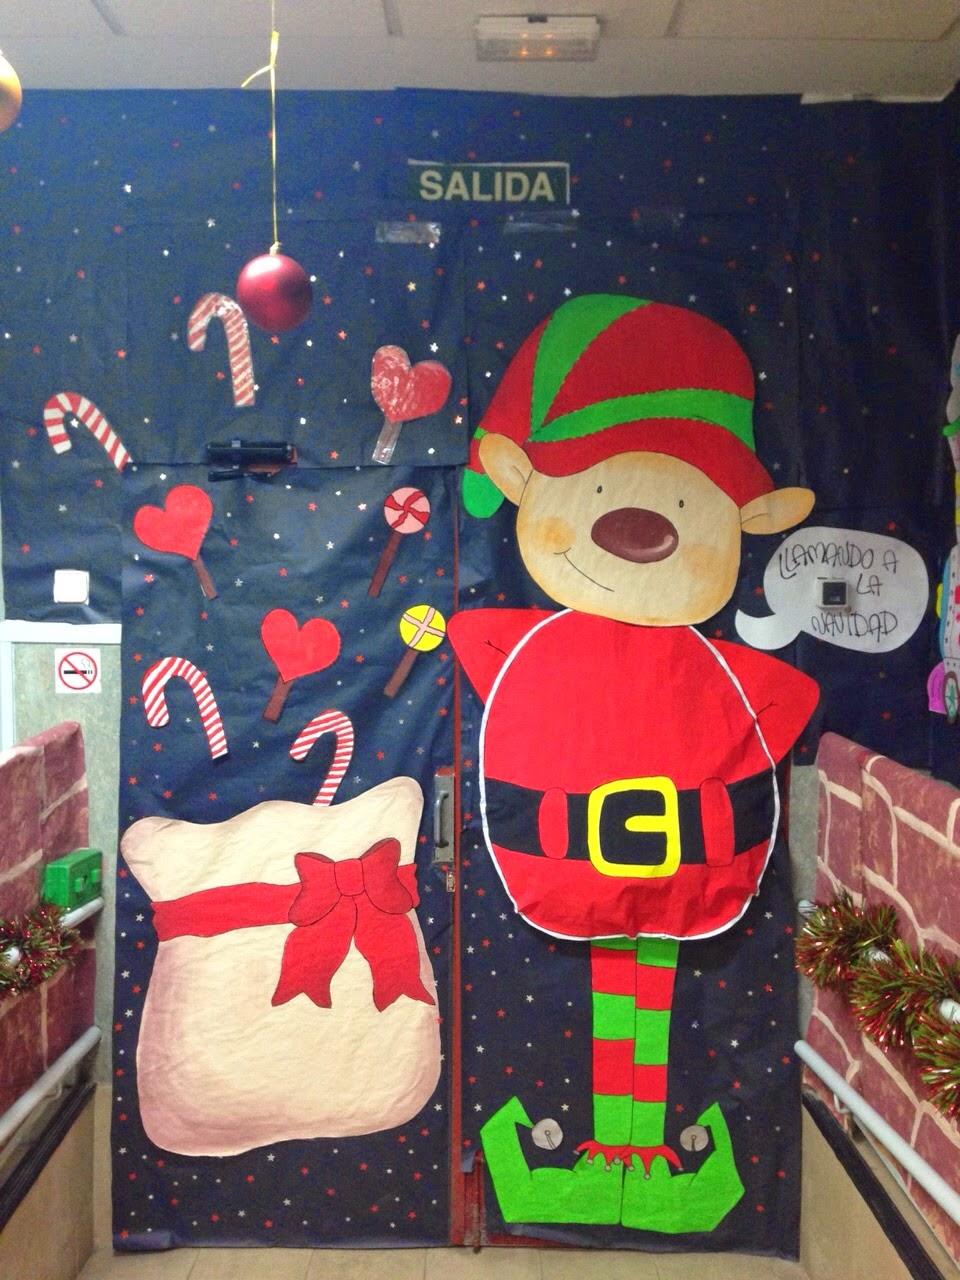 Ampa la guinda y se aproxima la navidad for Decoracion navidena infantil